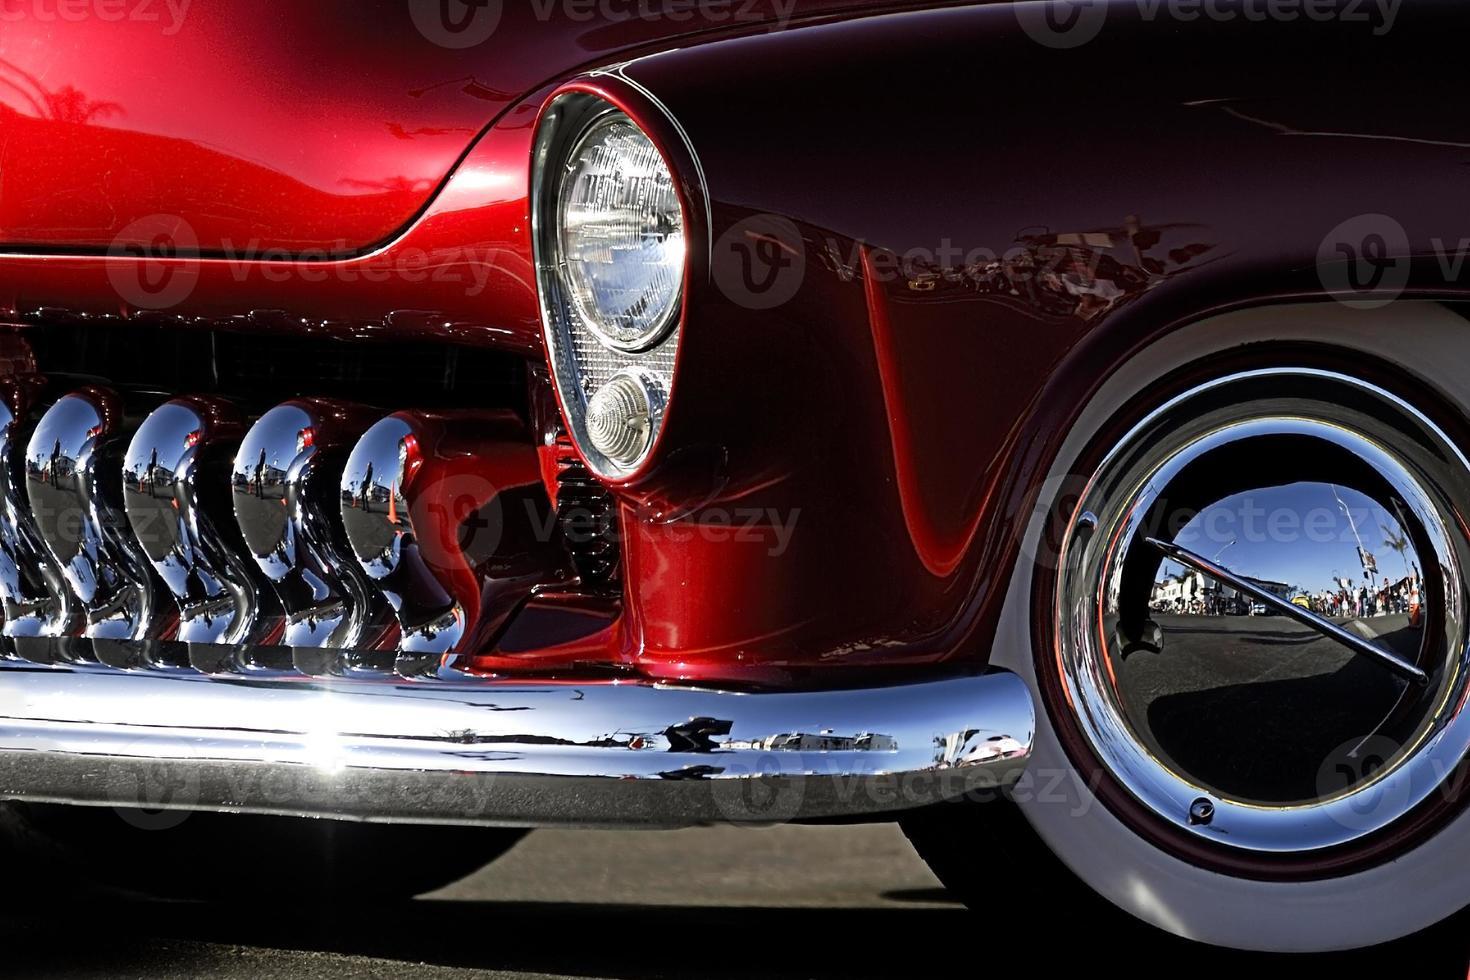 auto d'epoca: cromo rosso foto